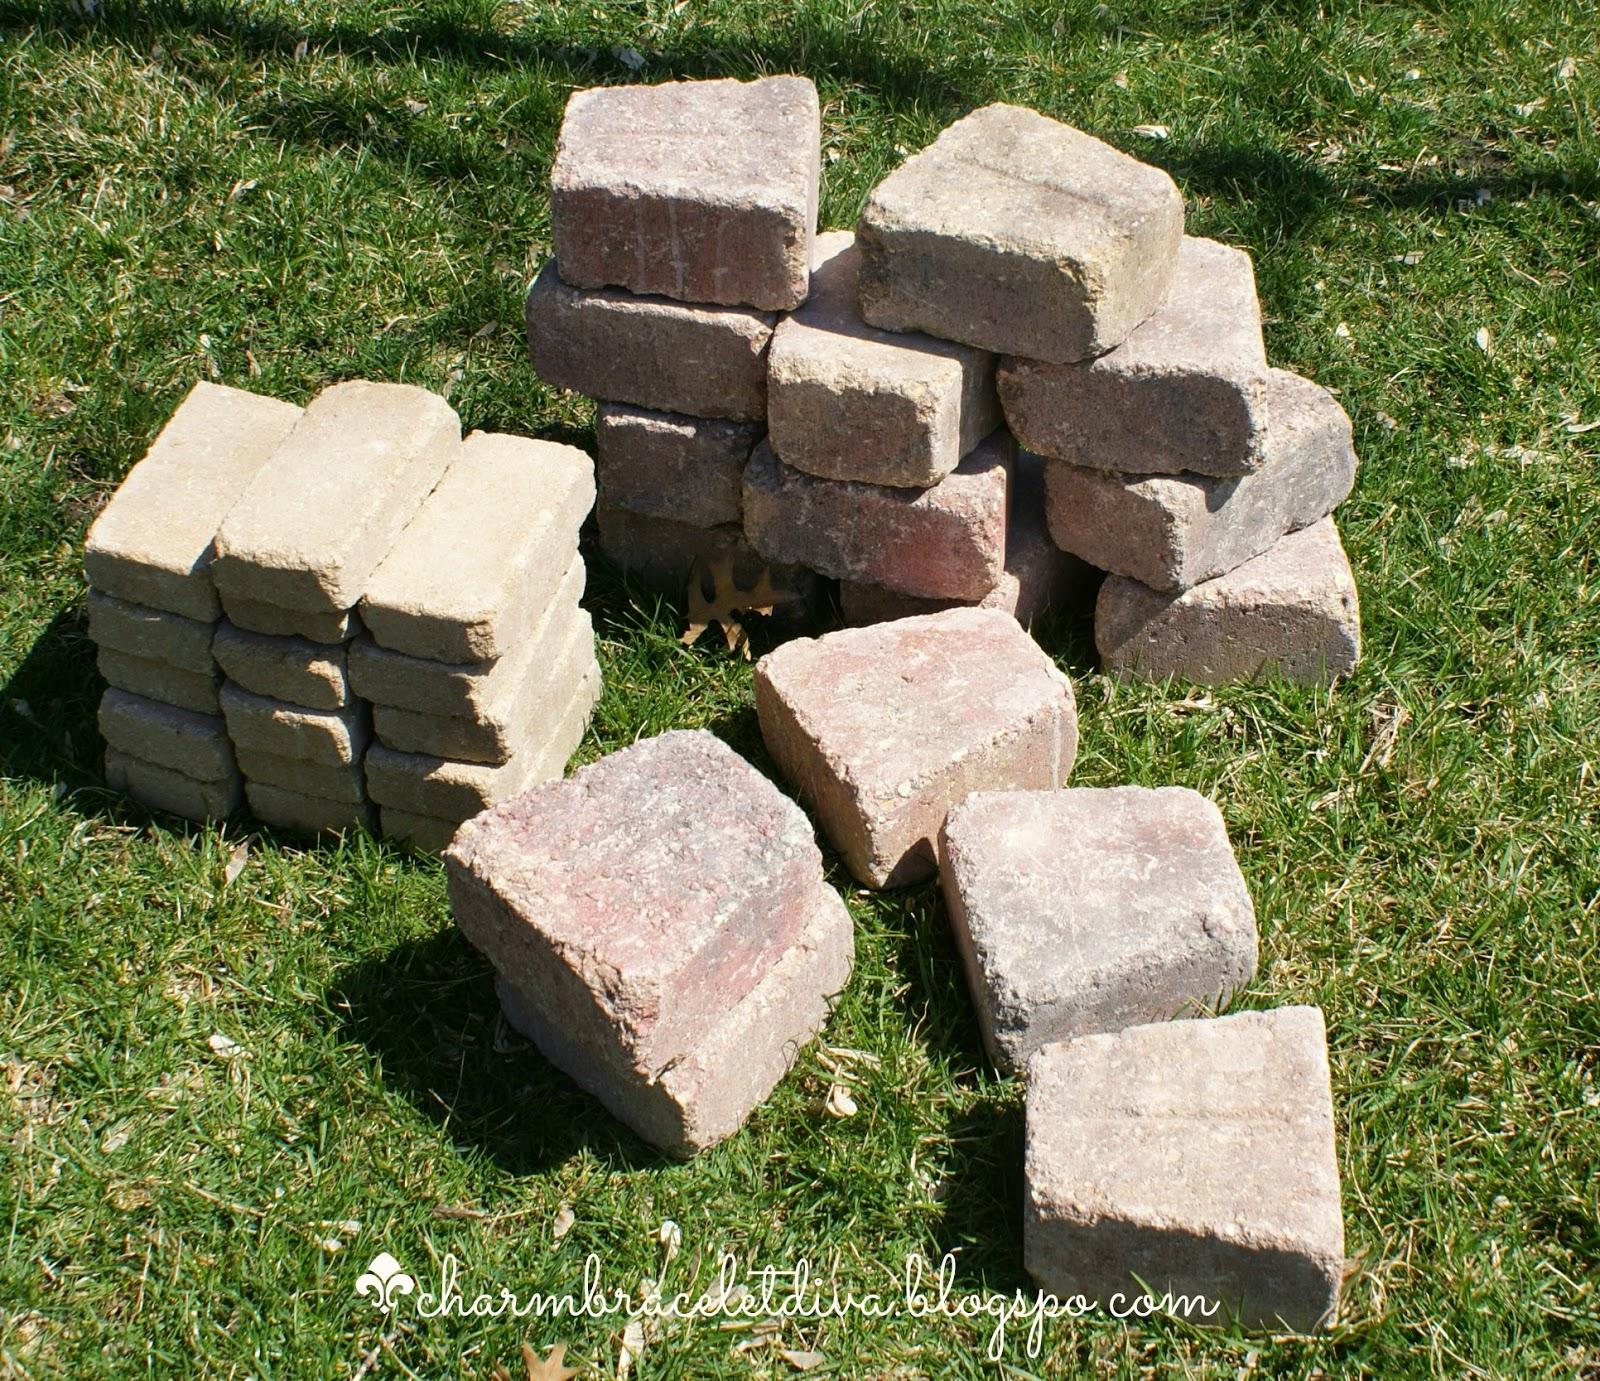 Belgian wedge blocks and Belgian small wall blocks